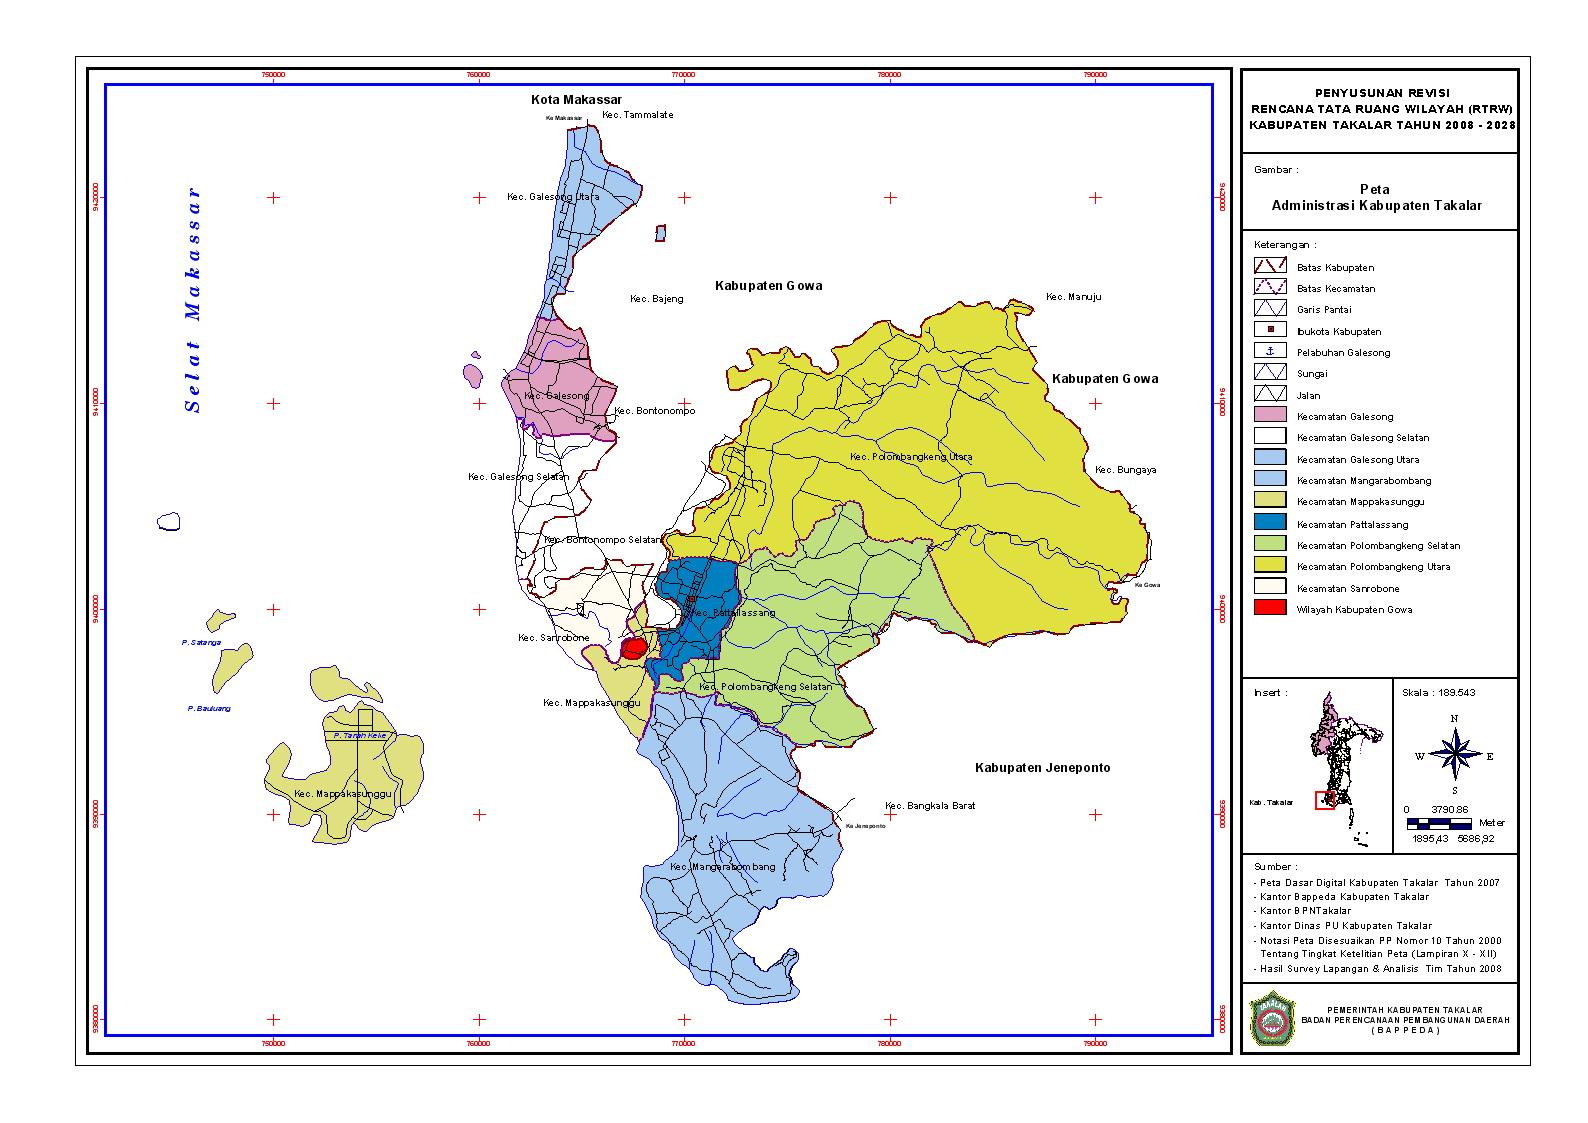 Yaitu pulau terbesar ketiga di dunia setelah greenland dan seluruh pulau irian. Peta Kota: Peta Kabupaten Takalar